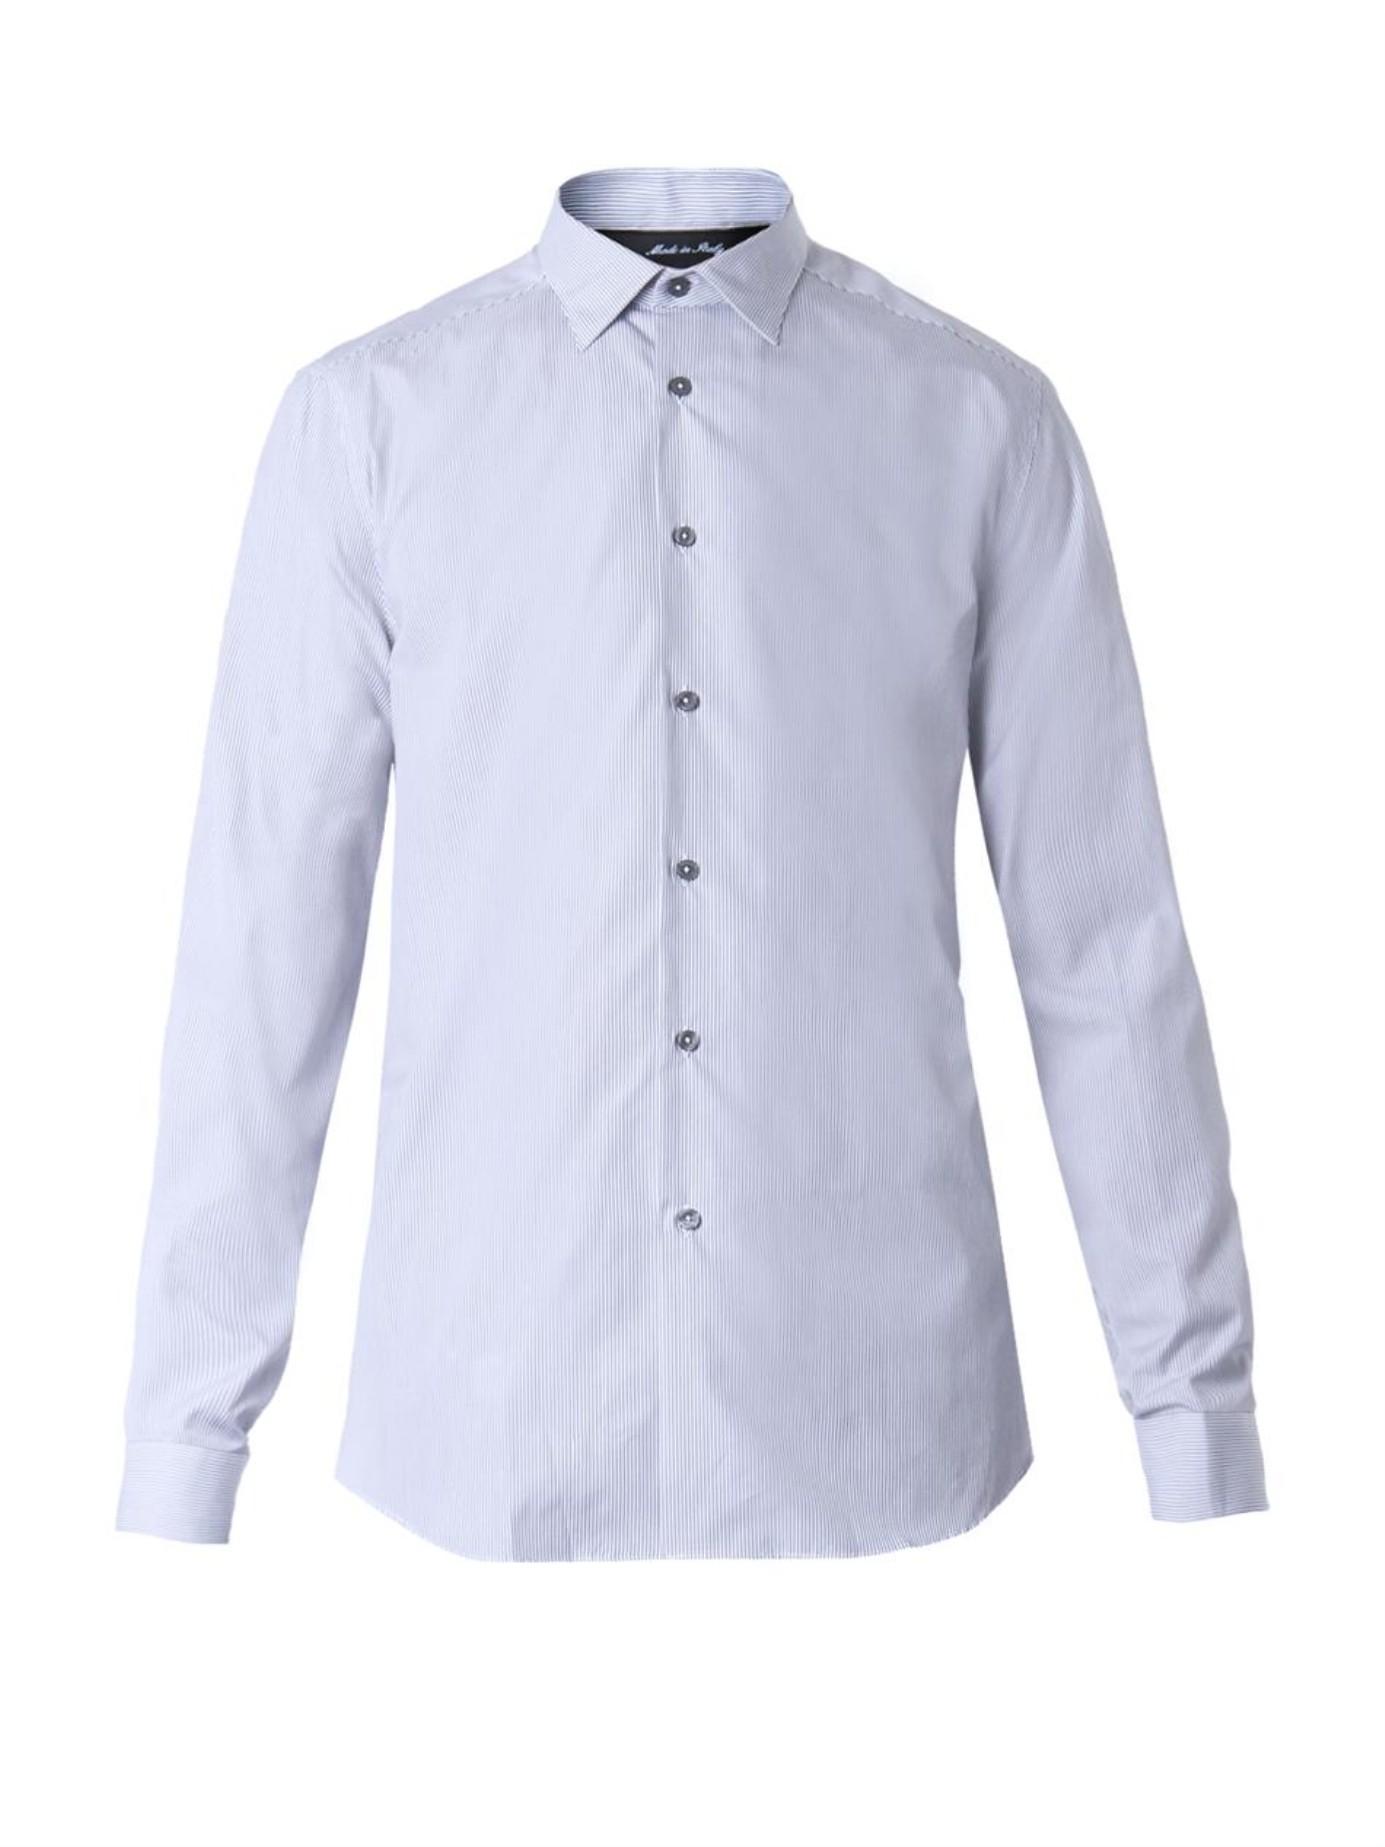 Paul Smith Byard Pinstripe Cotton Shirt In Blue For Men